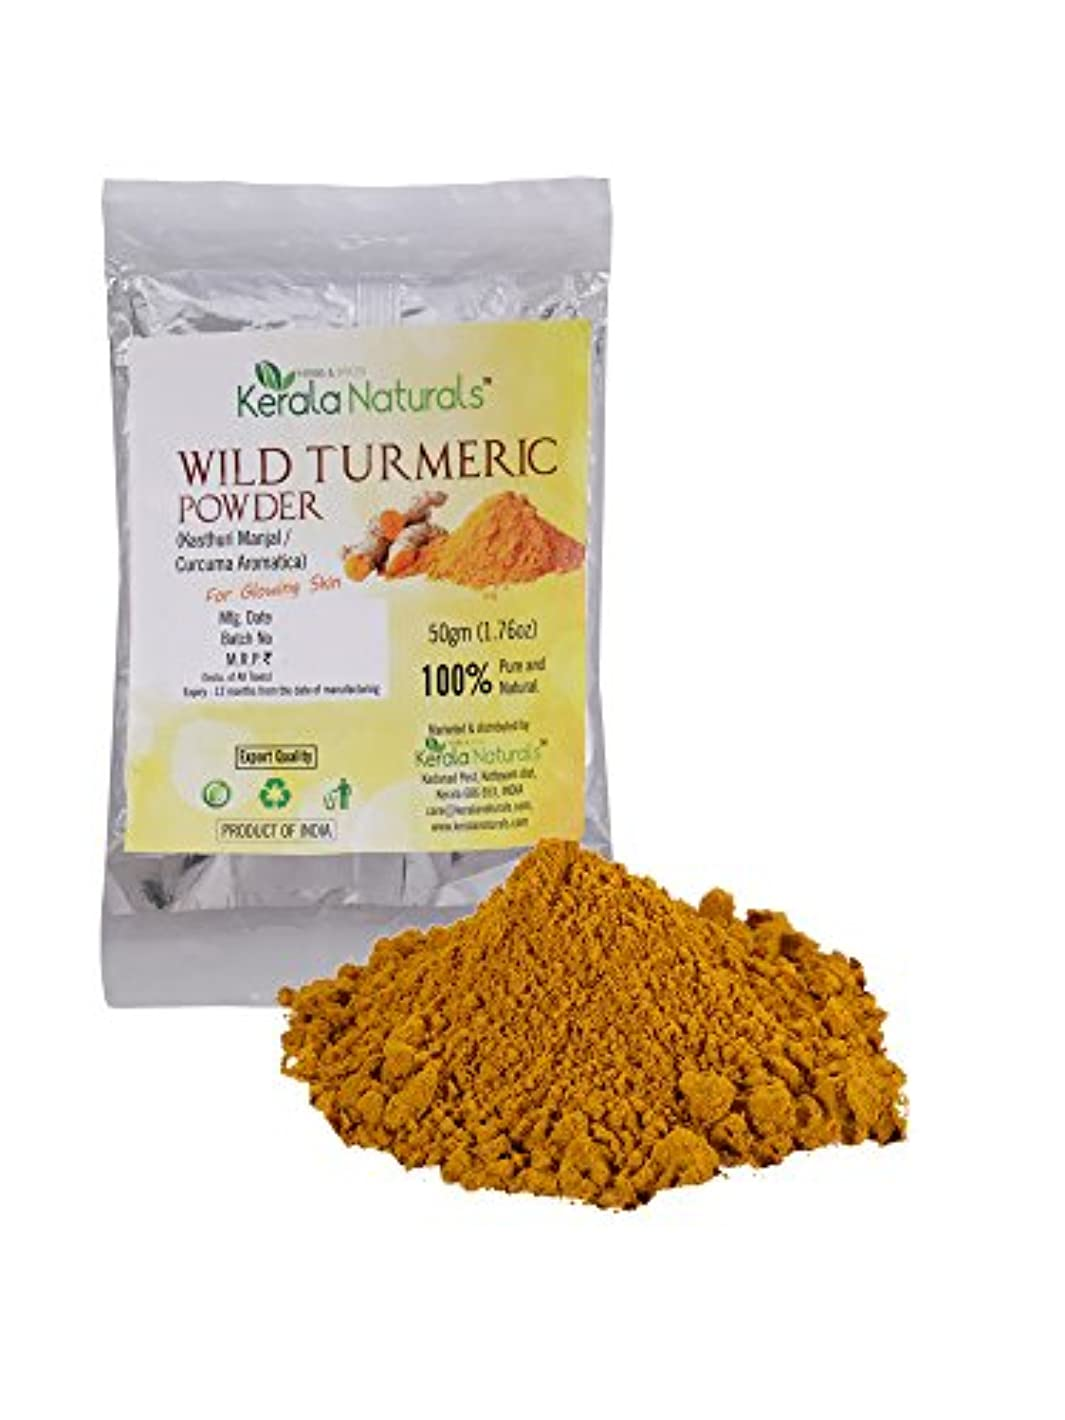 Kerala Naturals Wild Turmeric - Kasthuri Manjal: For Glowing Skin - 100 gm - ケララナチュラルズワイルドウコン-カストゥリマンジャール:輝く肌用...